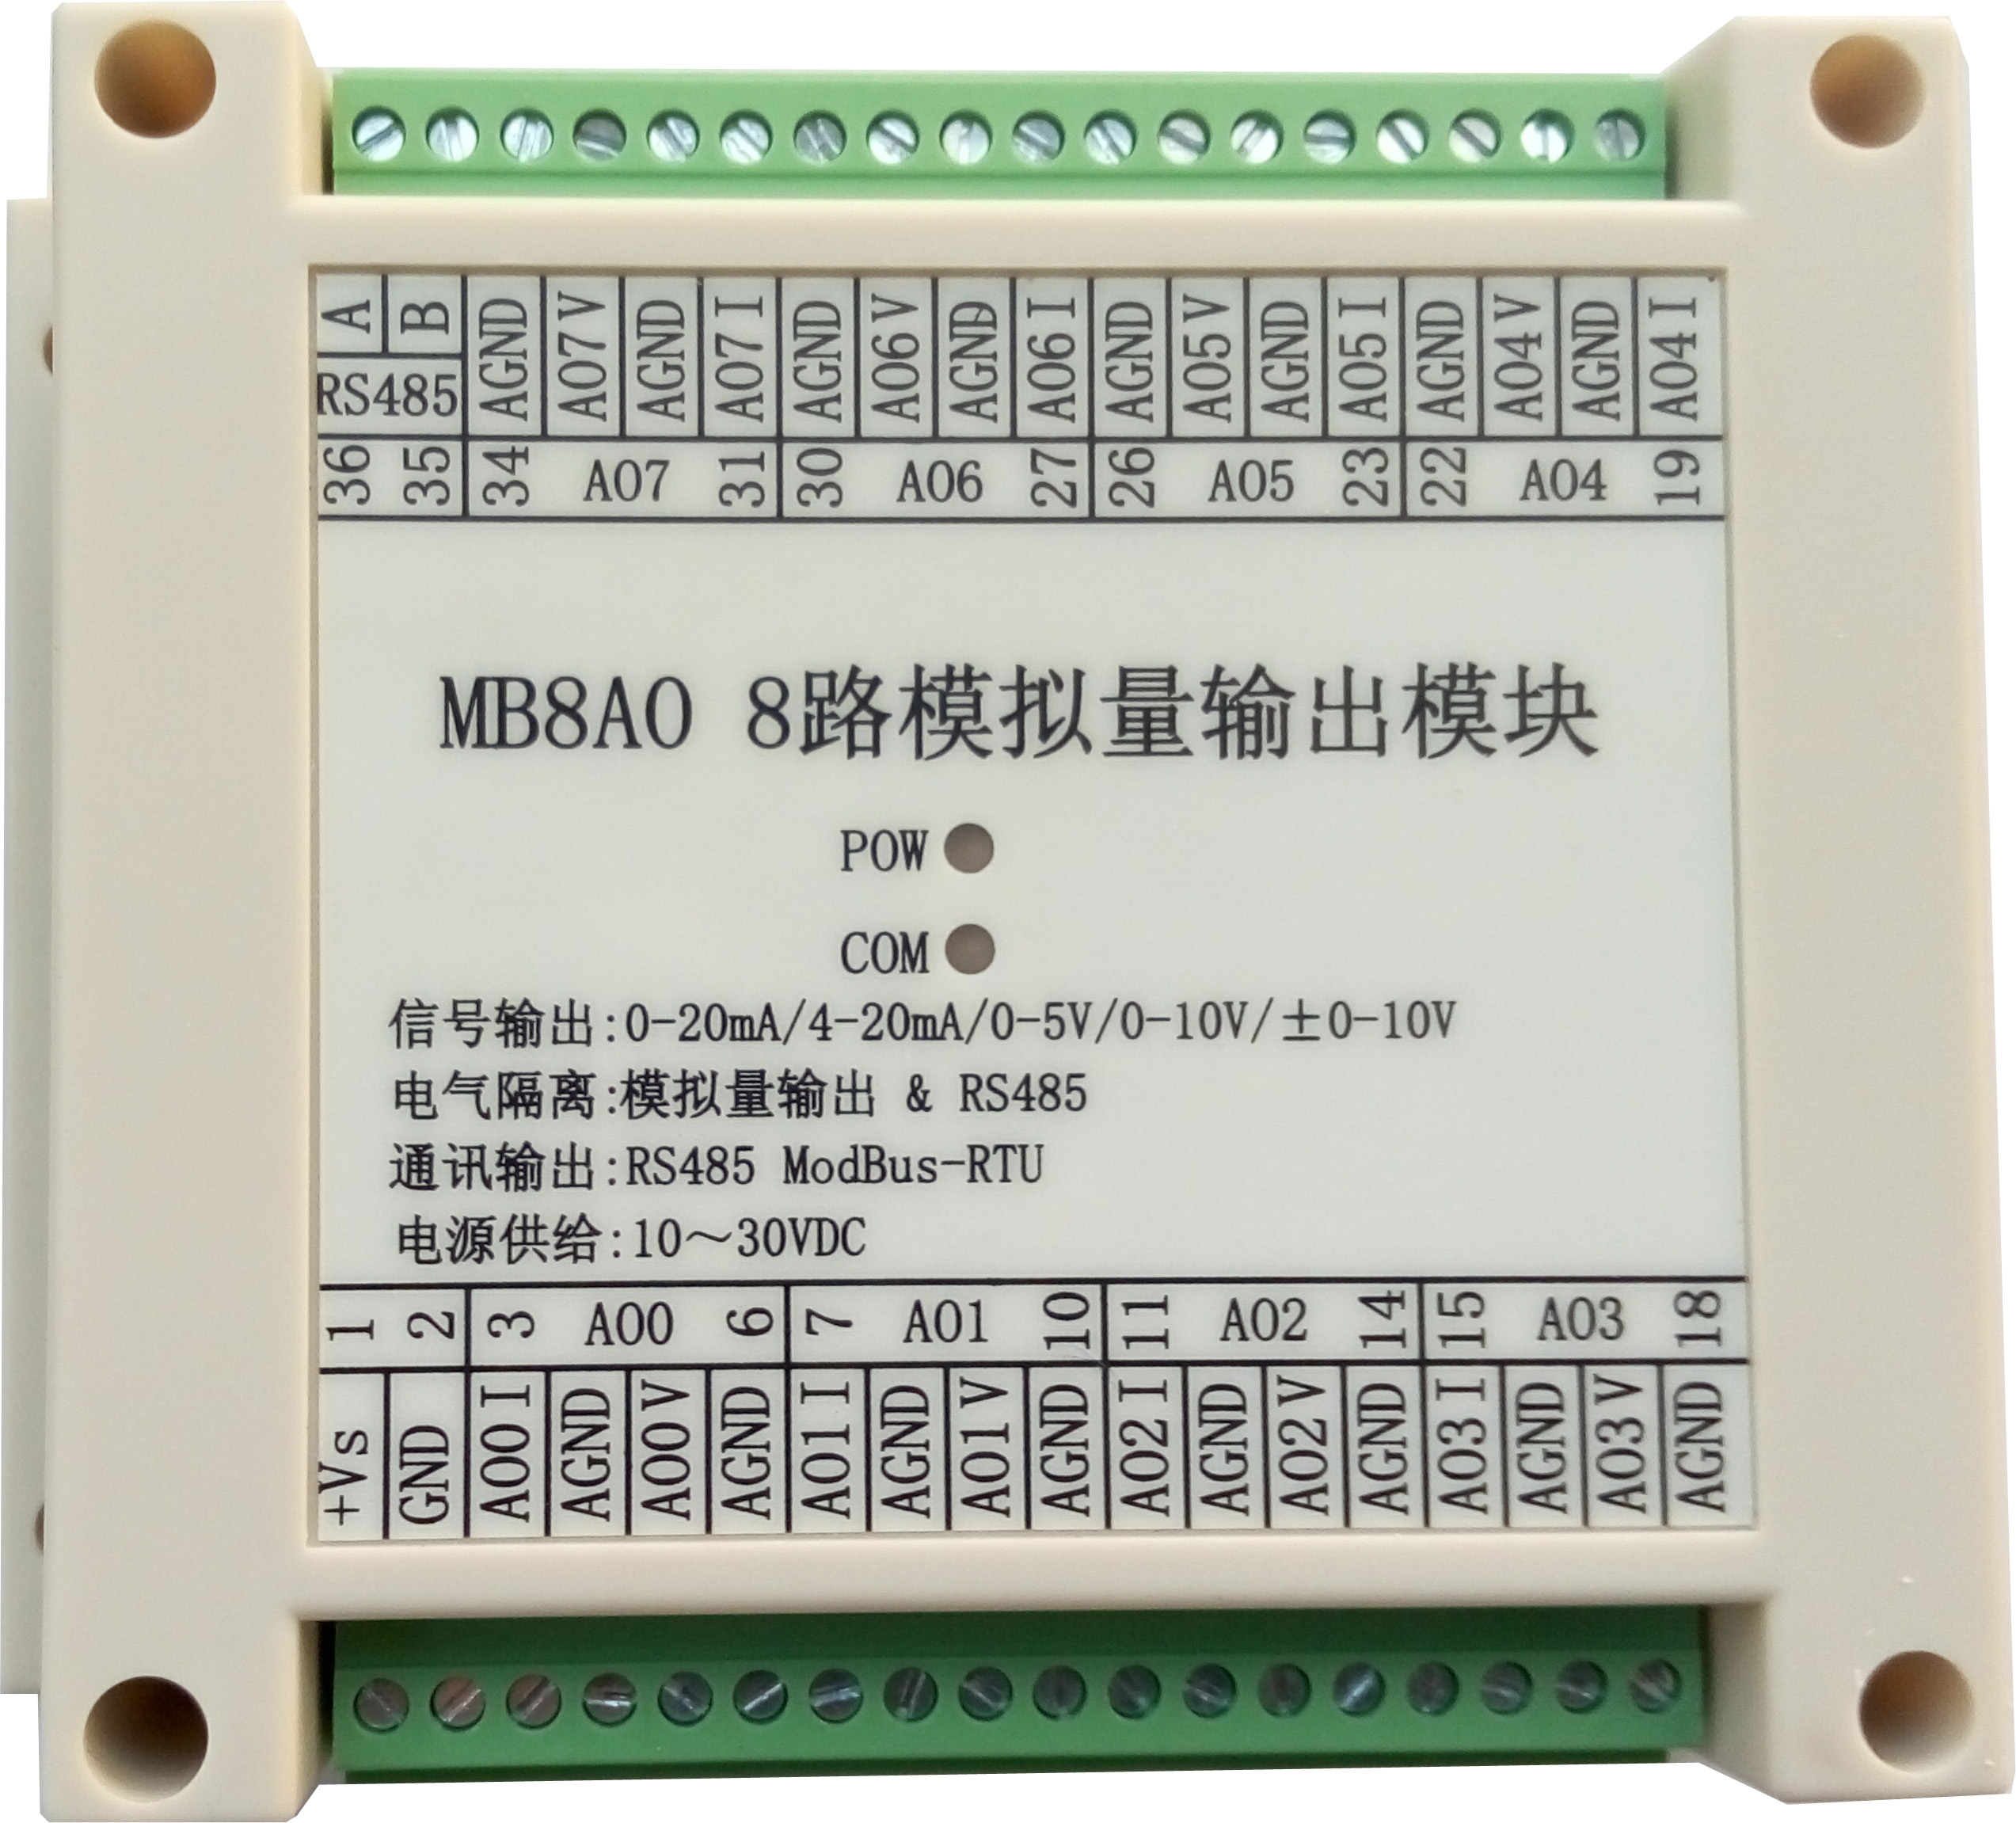 0-20MA/4-20MA/0-5V/0-10V/ + 10V Analog Output Acquisition Module RS485 MODBUS